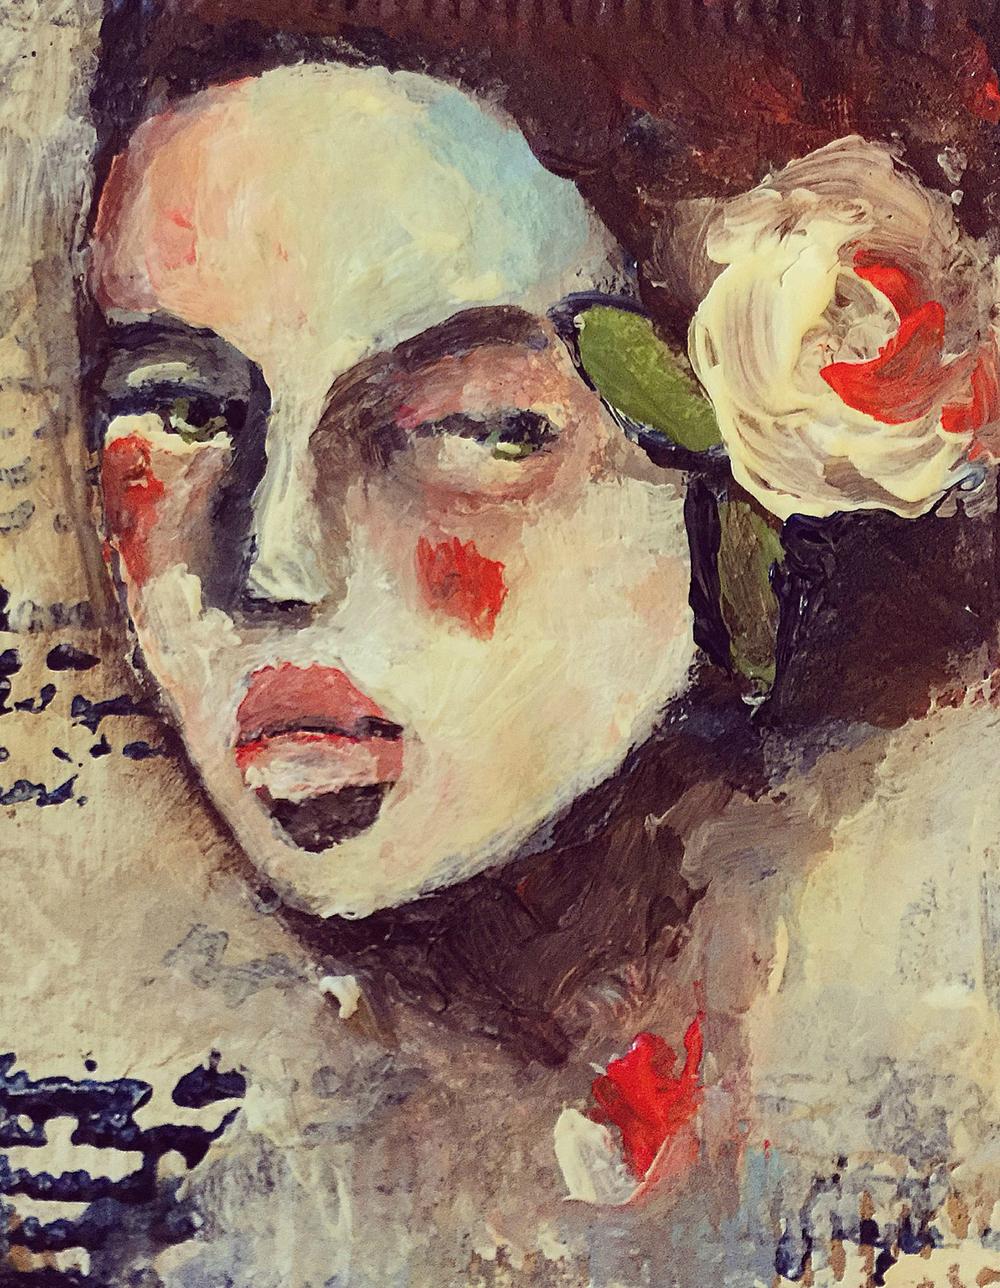 How to do tea bag painting, Jeanne-Marie Webb